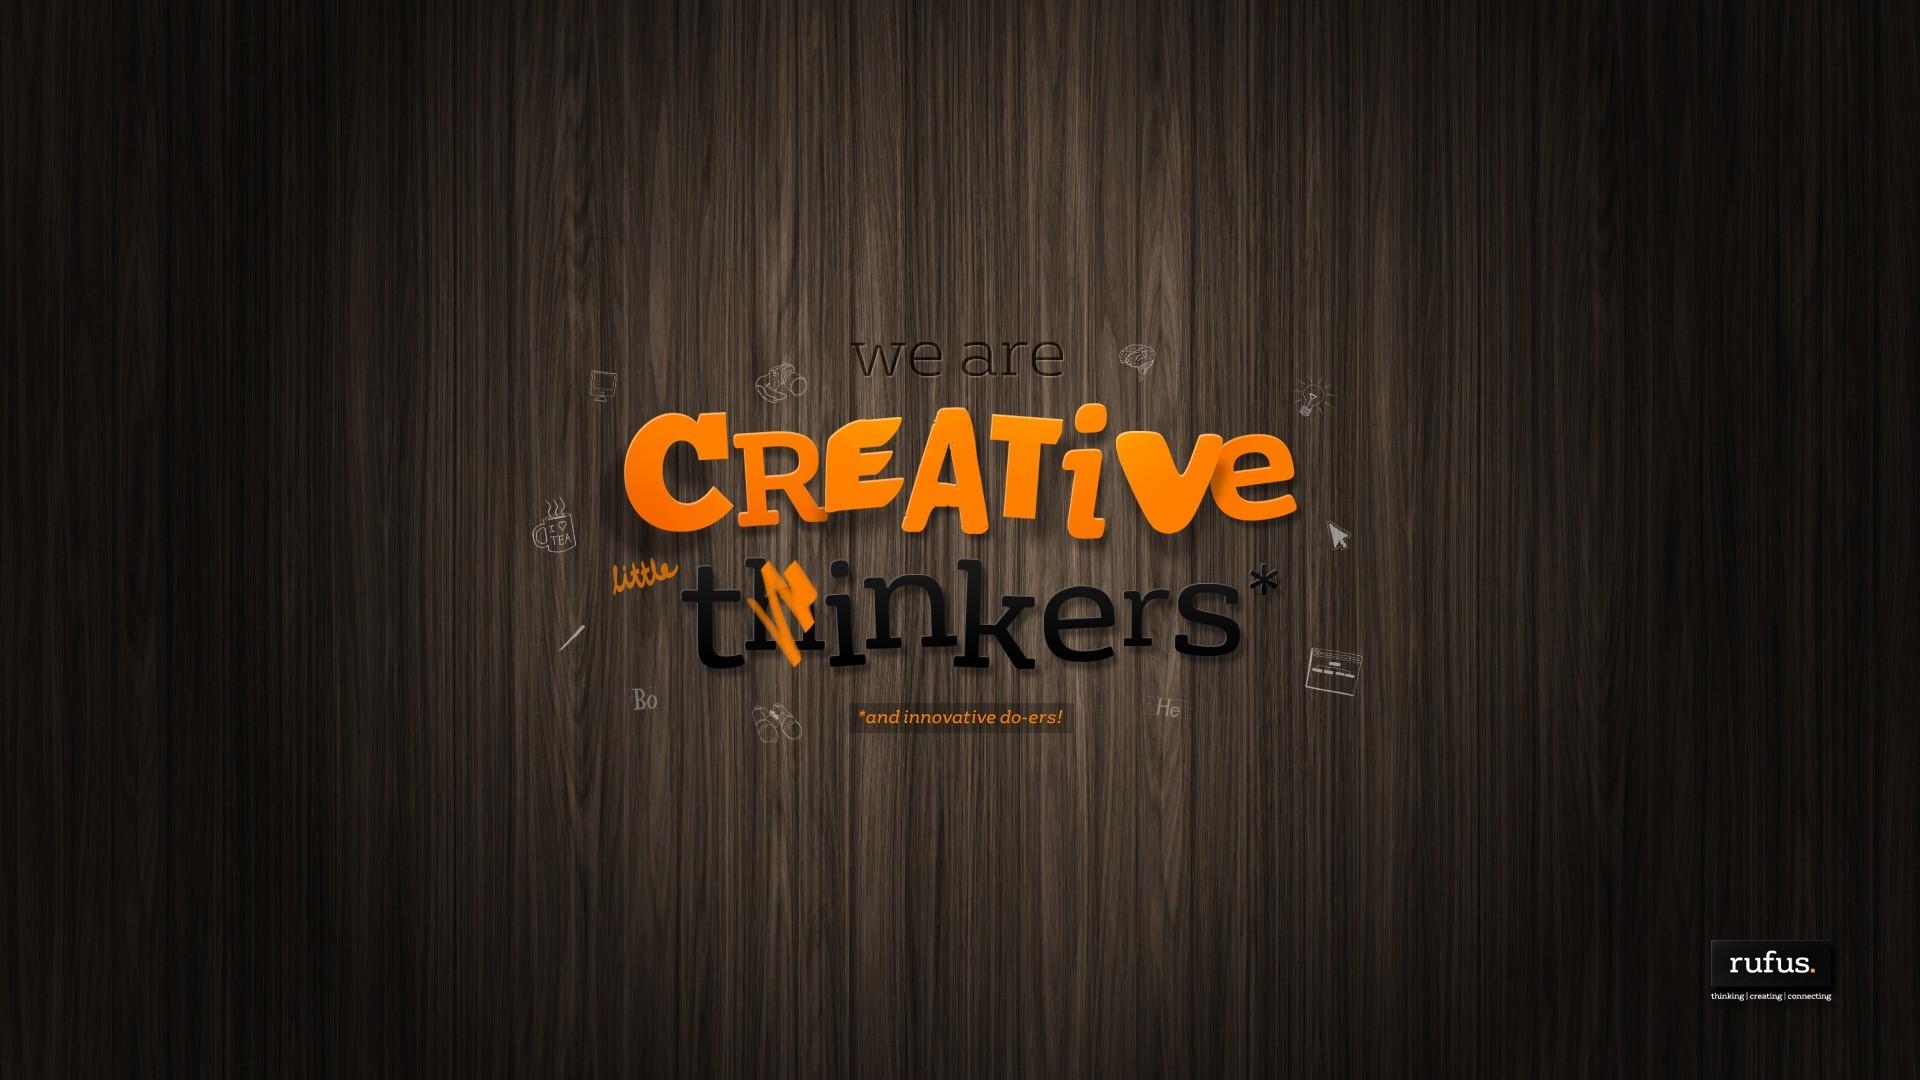 creative wallpapers for desktop (66+ images)